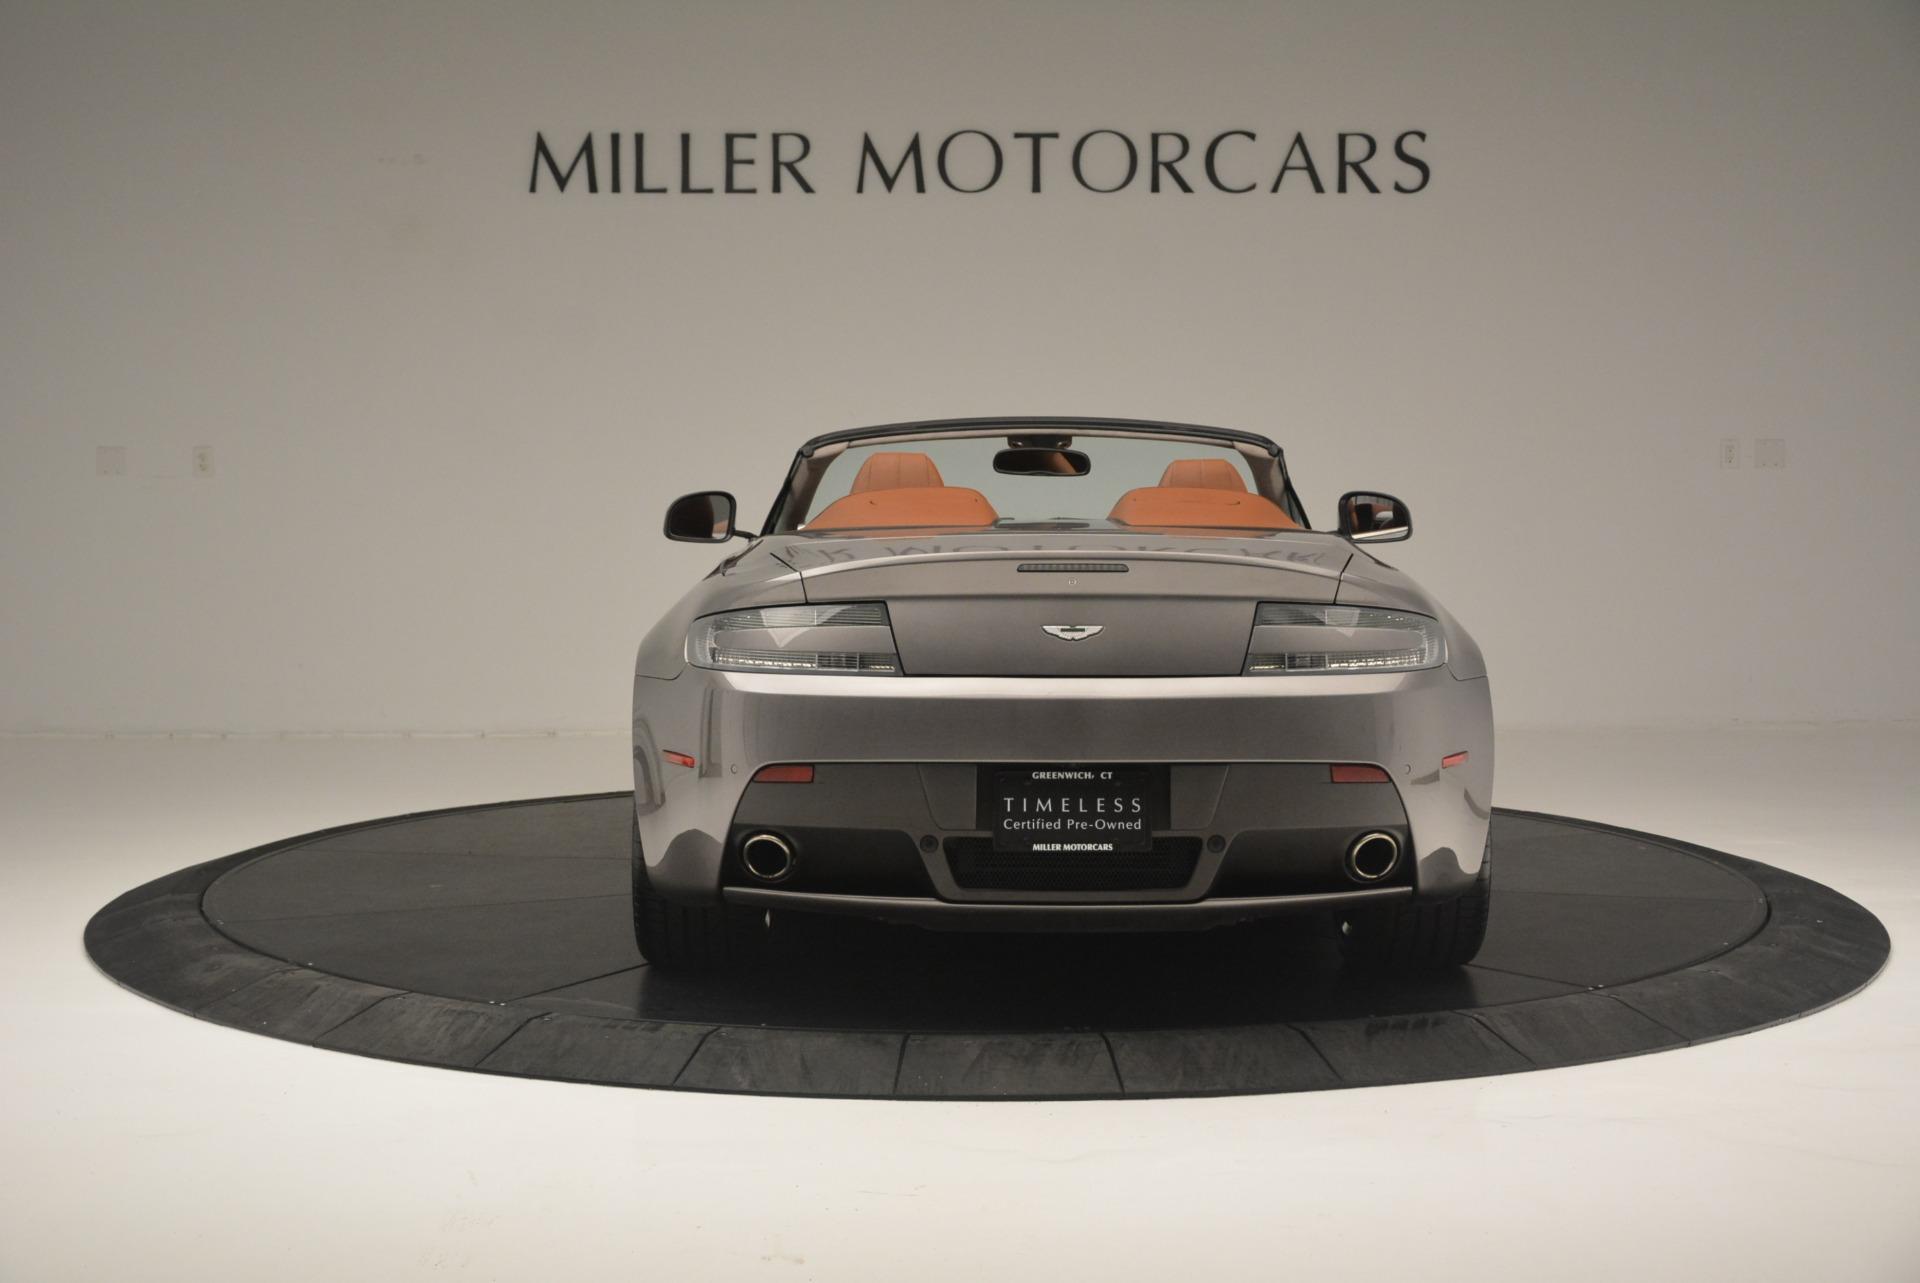 Used 2015 Aston Martin V8 Vantage Roadster For Sale In Greenwich, CT. Alfa Romeo of Greenwich, 7396 2463_p6